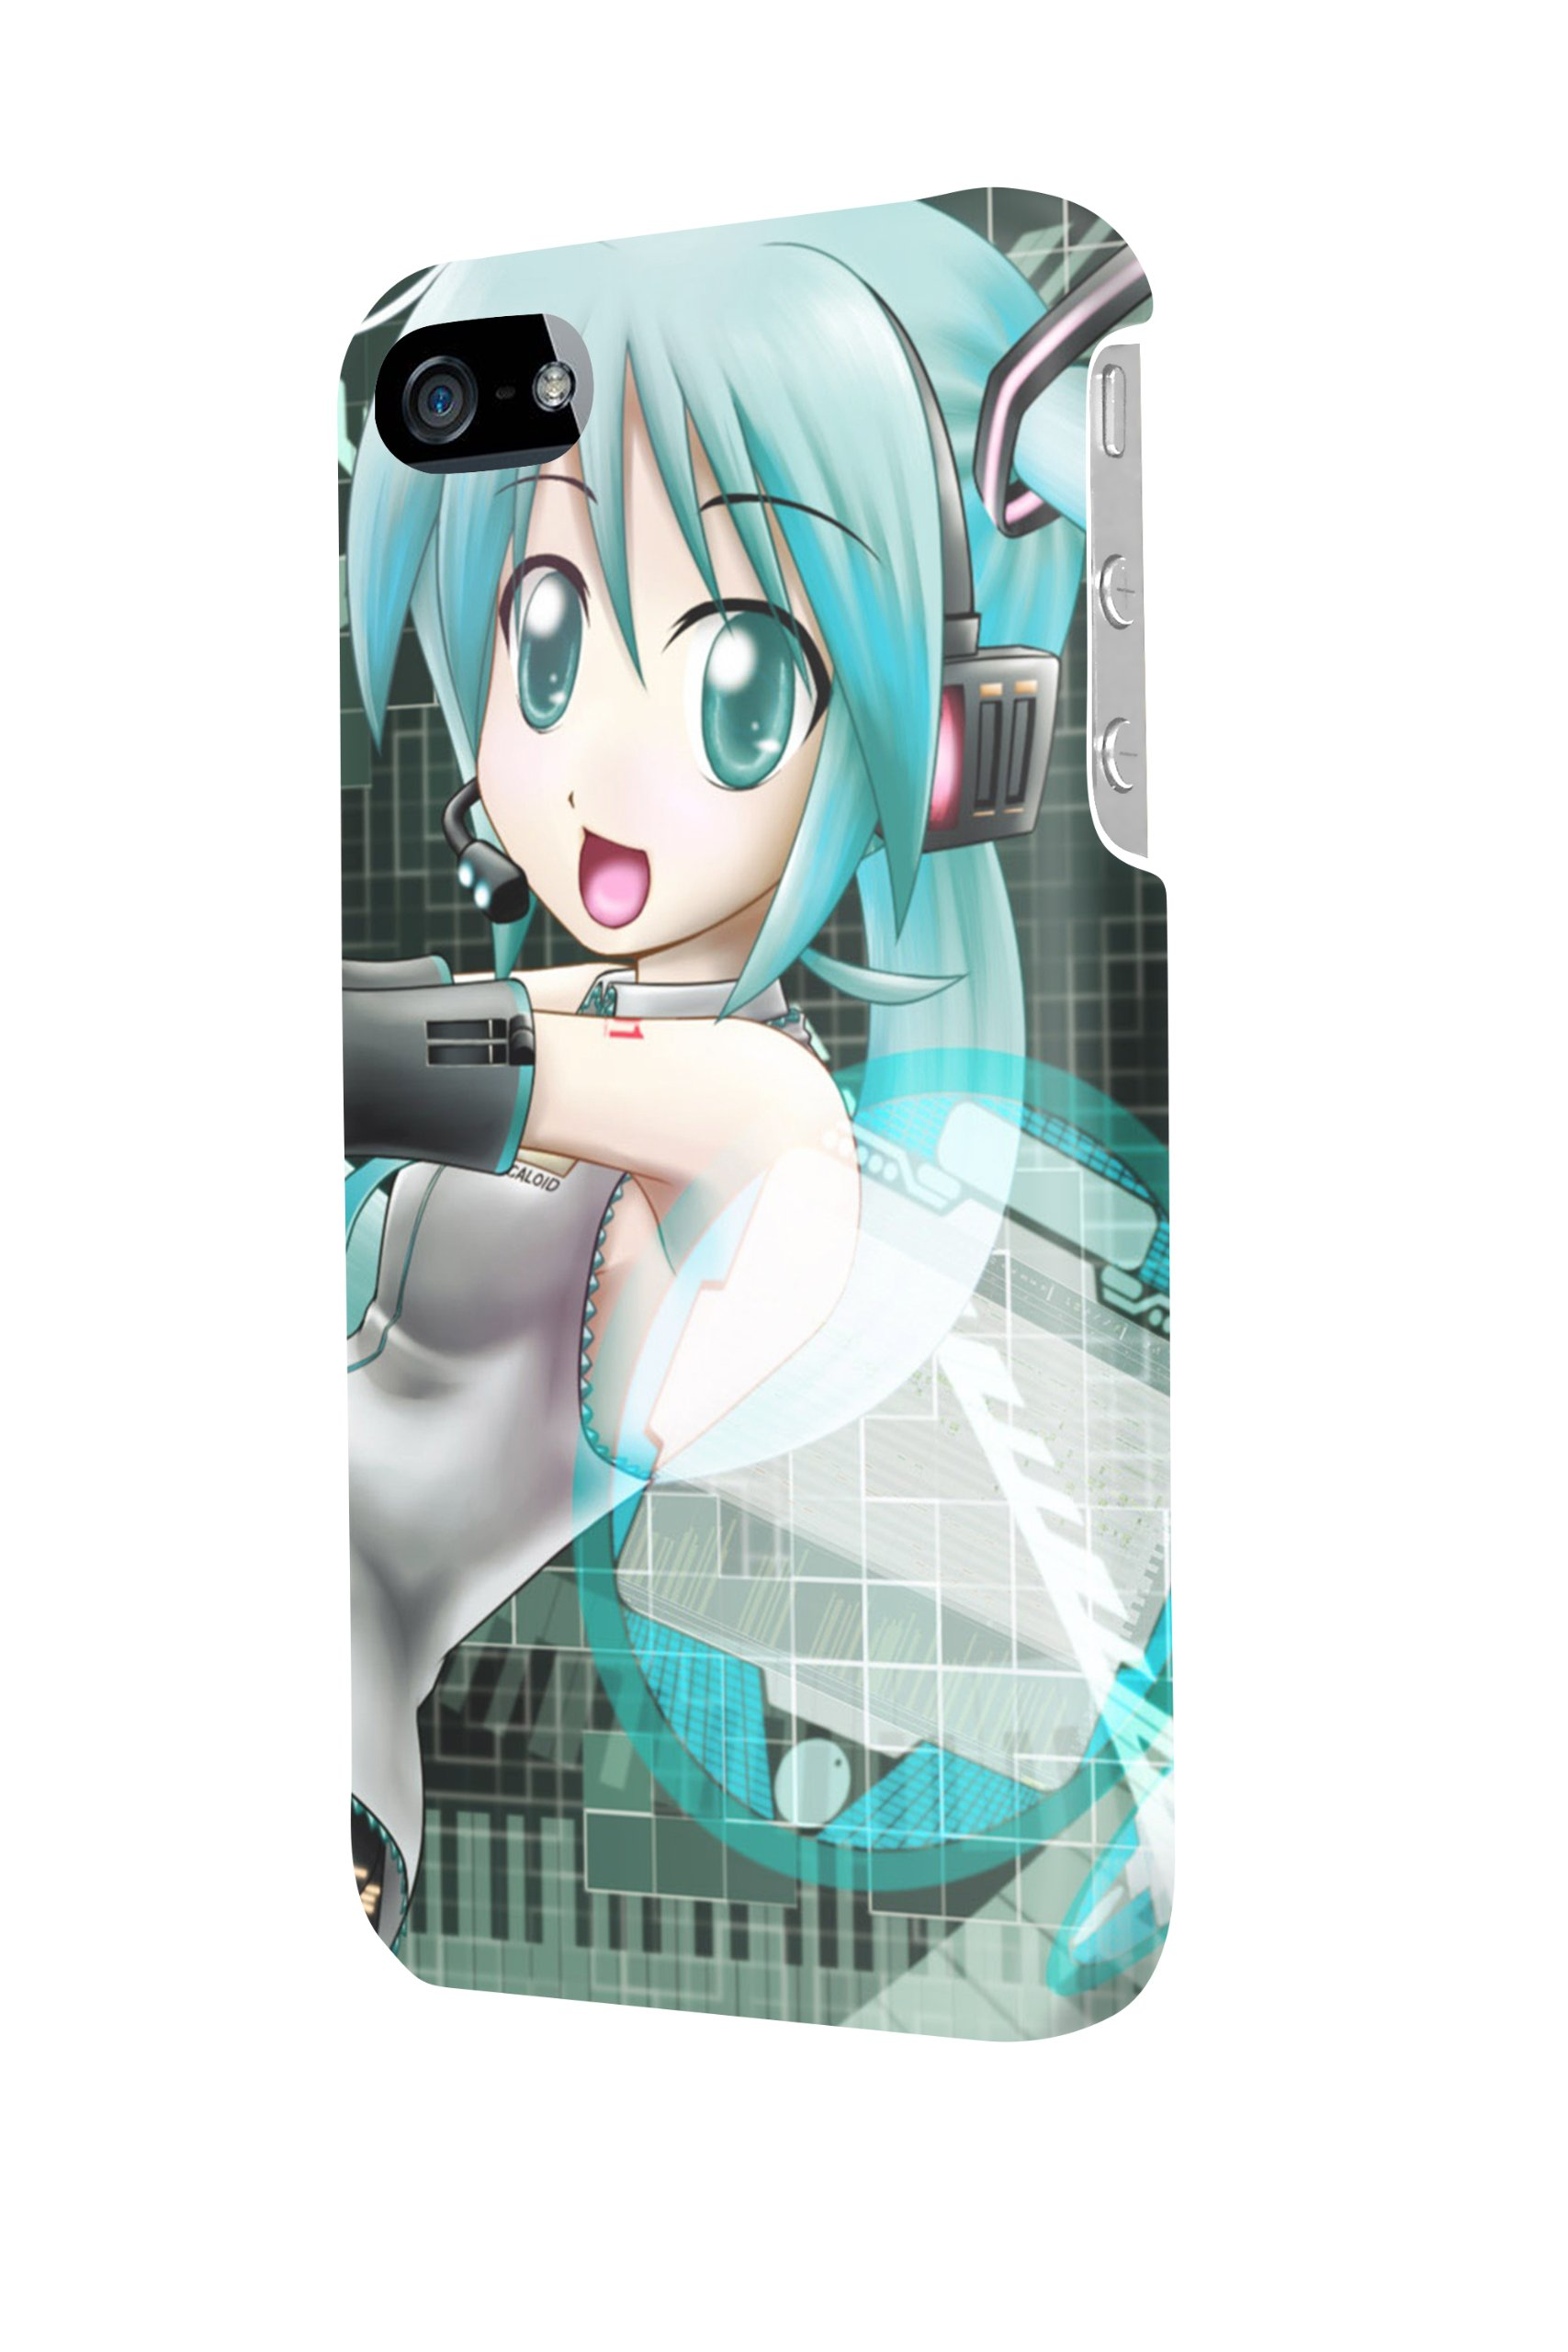 ip50535Vocaloid Hatsune Miku Cute Cartoon Glossy Custodia protettiva Case Cover for iPhone 5/5S